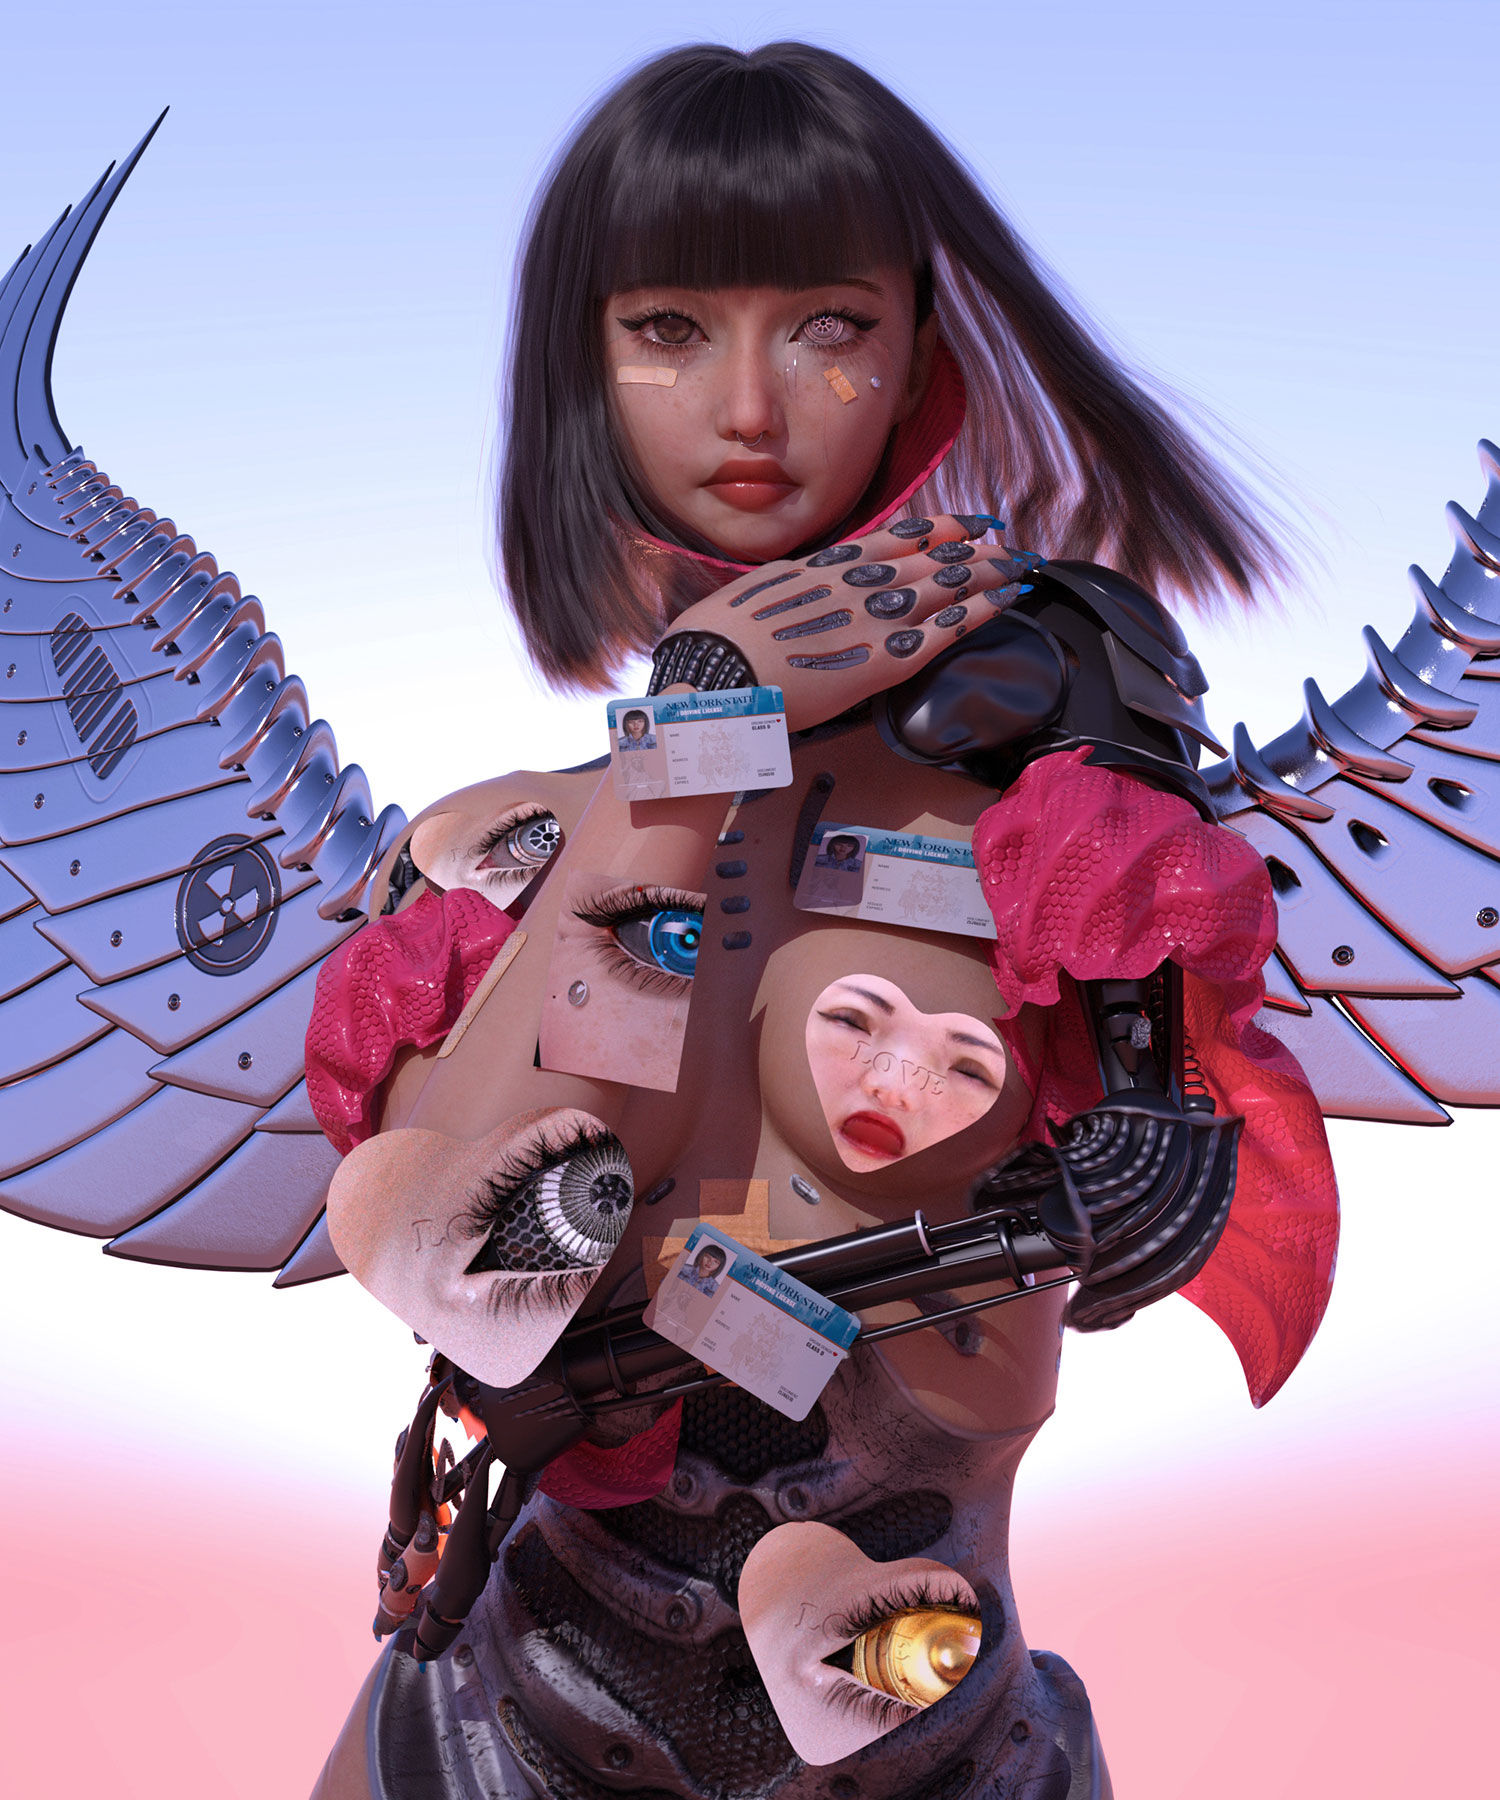 Conoce a Ruby Gloom, la artista transhumanista que se transforma guerrera digital del futuro a través de avatares 3D